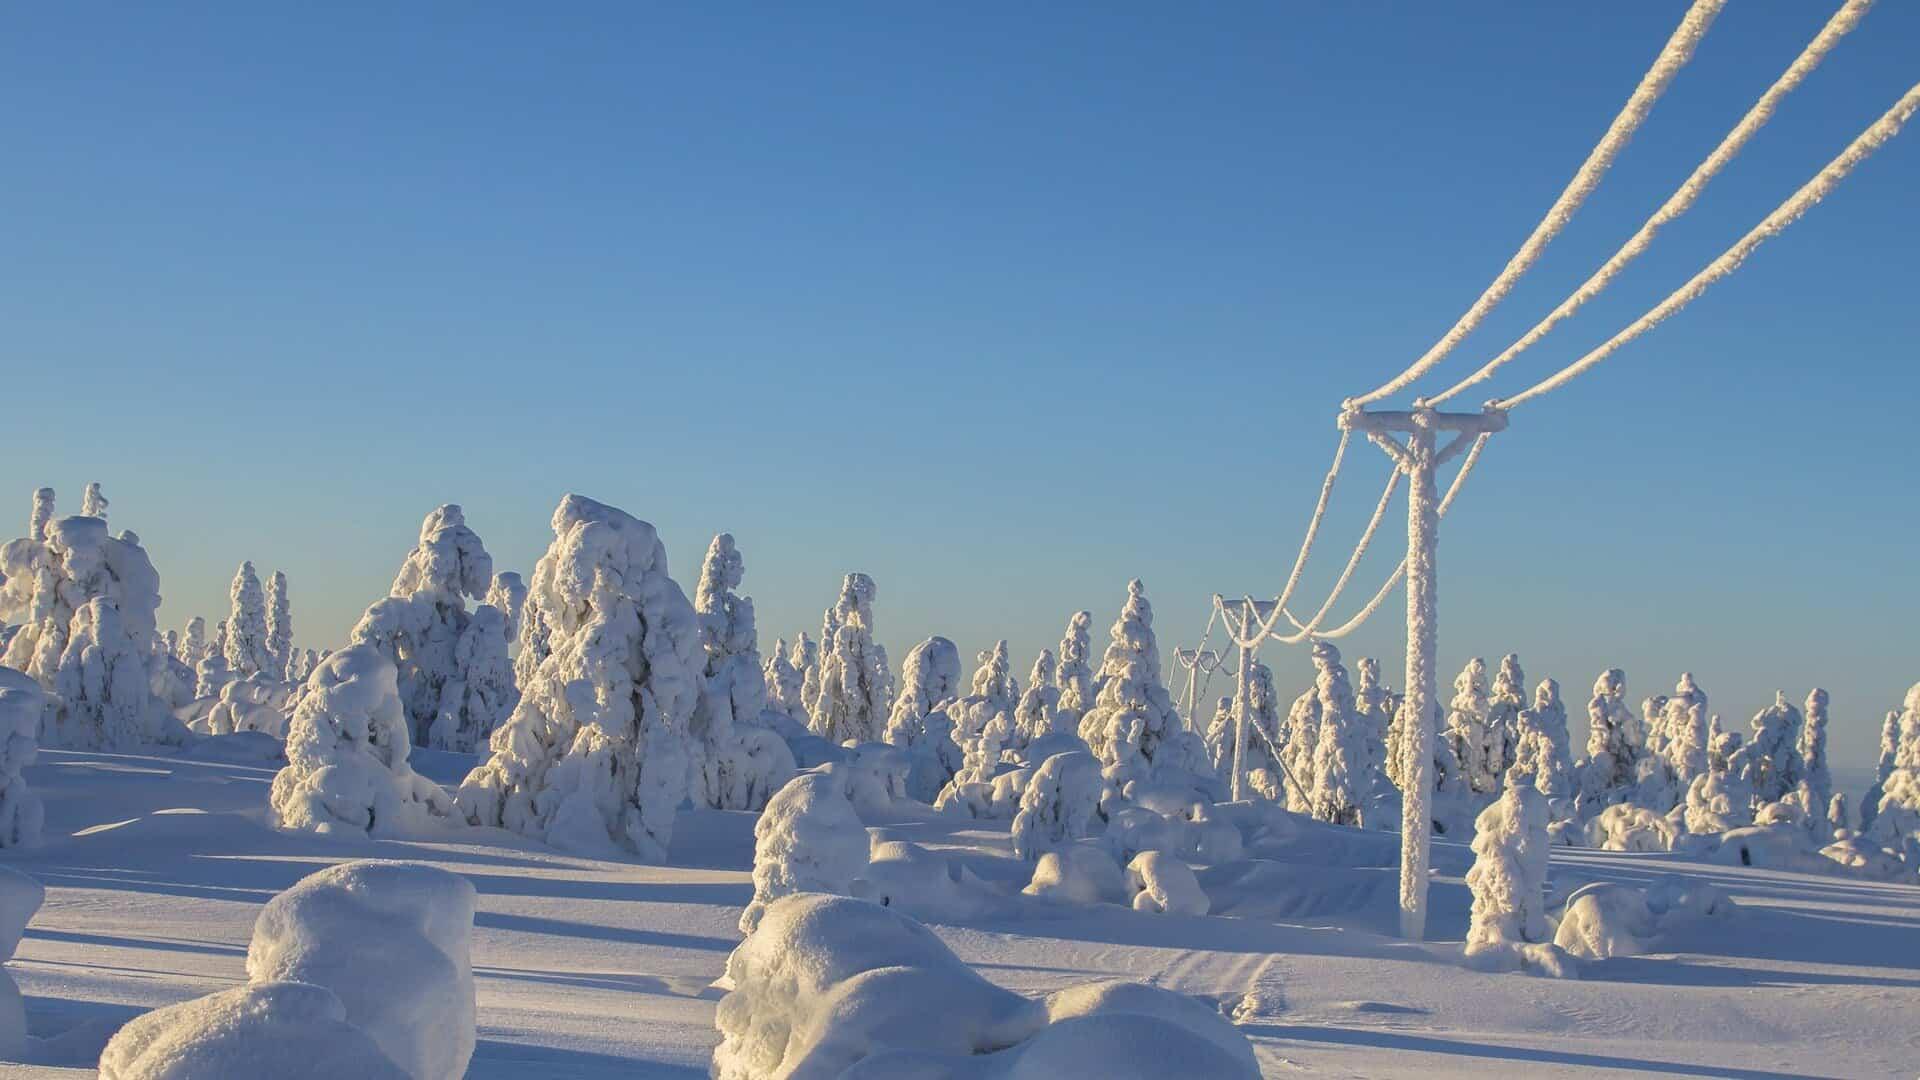 Lapland Finland Winter Season WHATTOGETMY